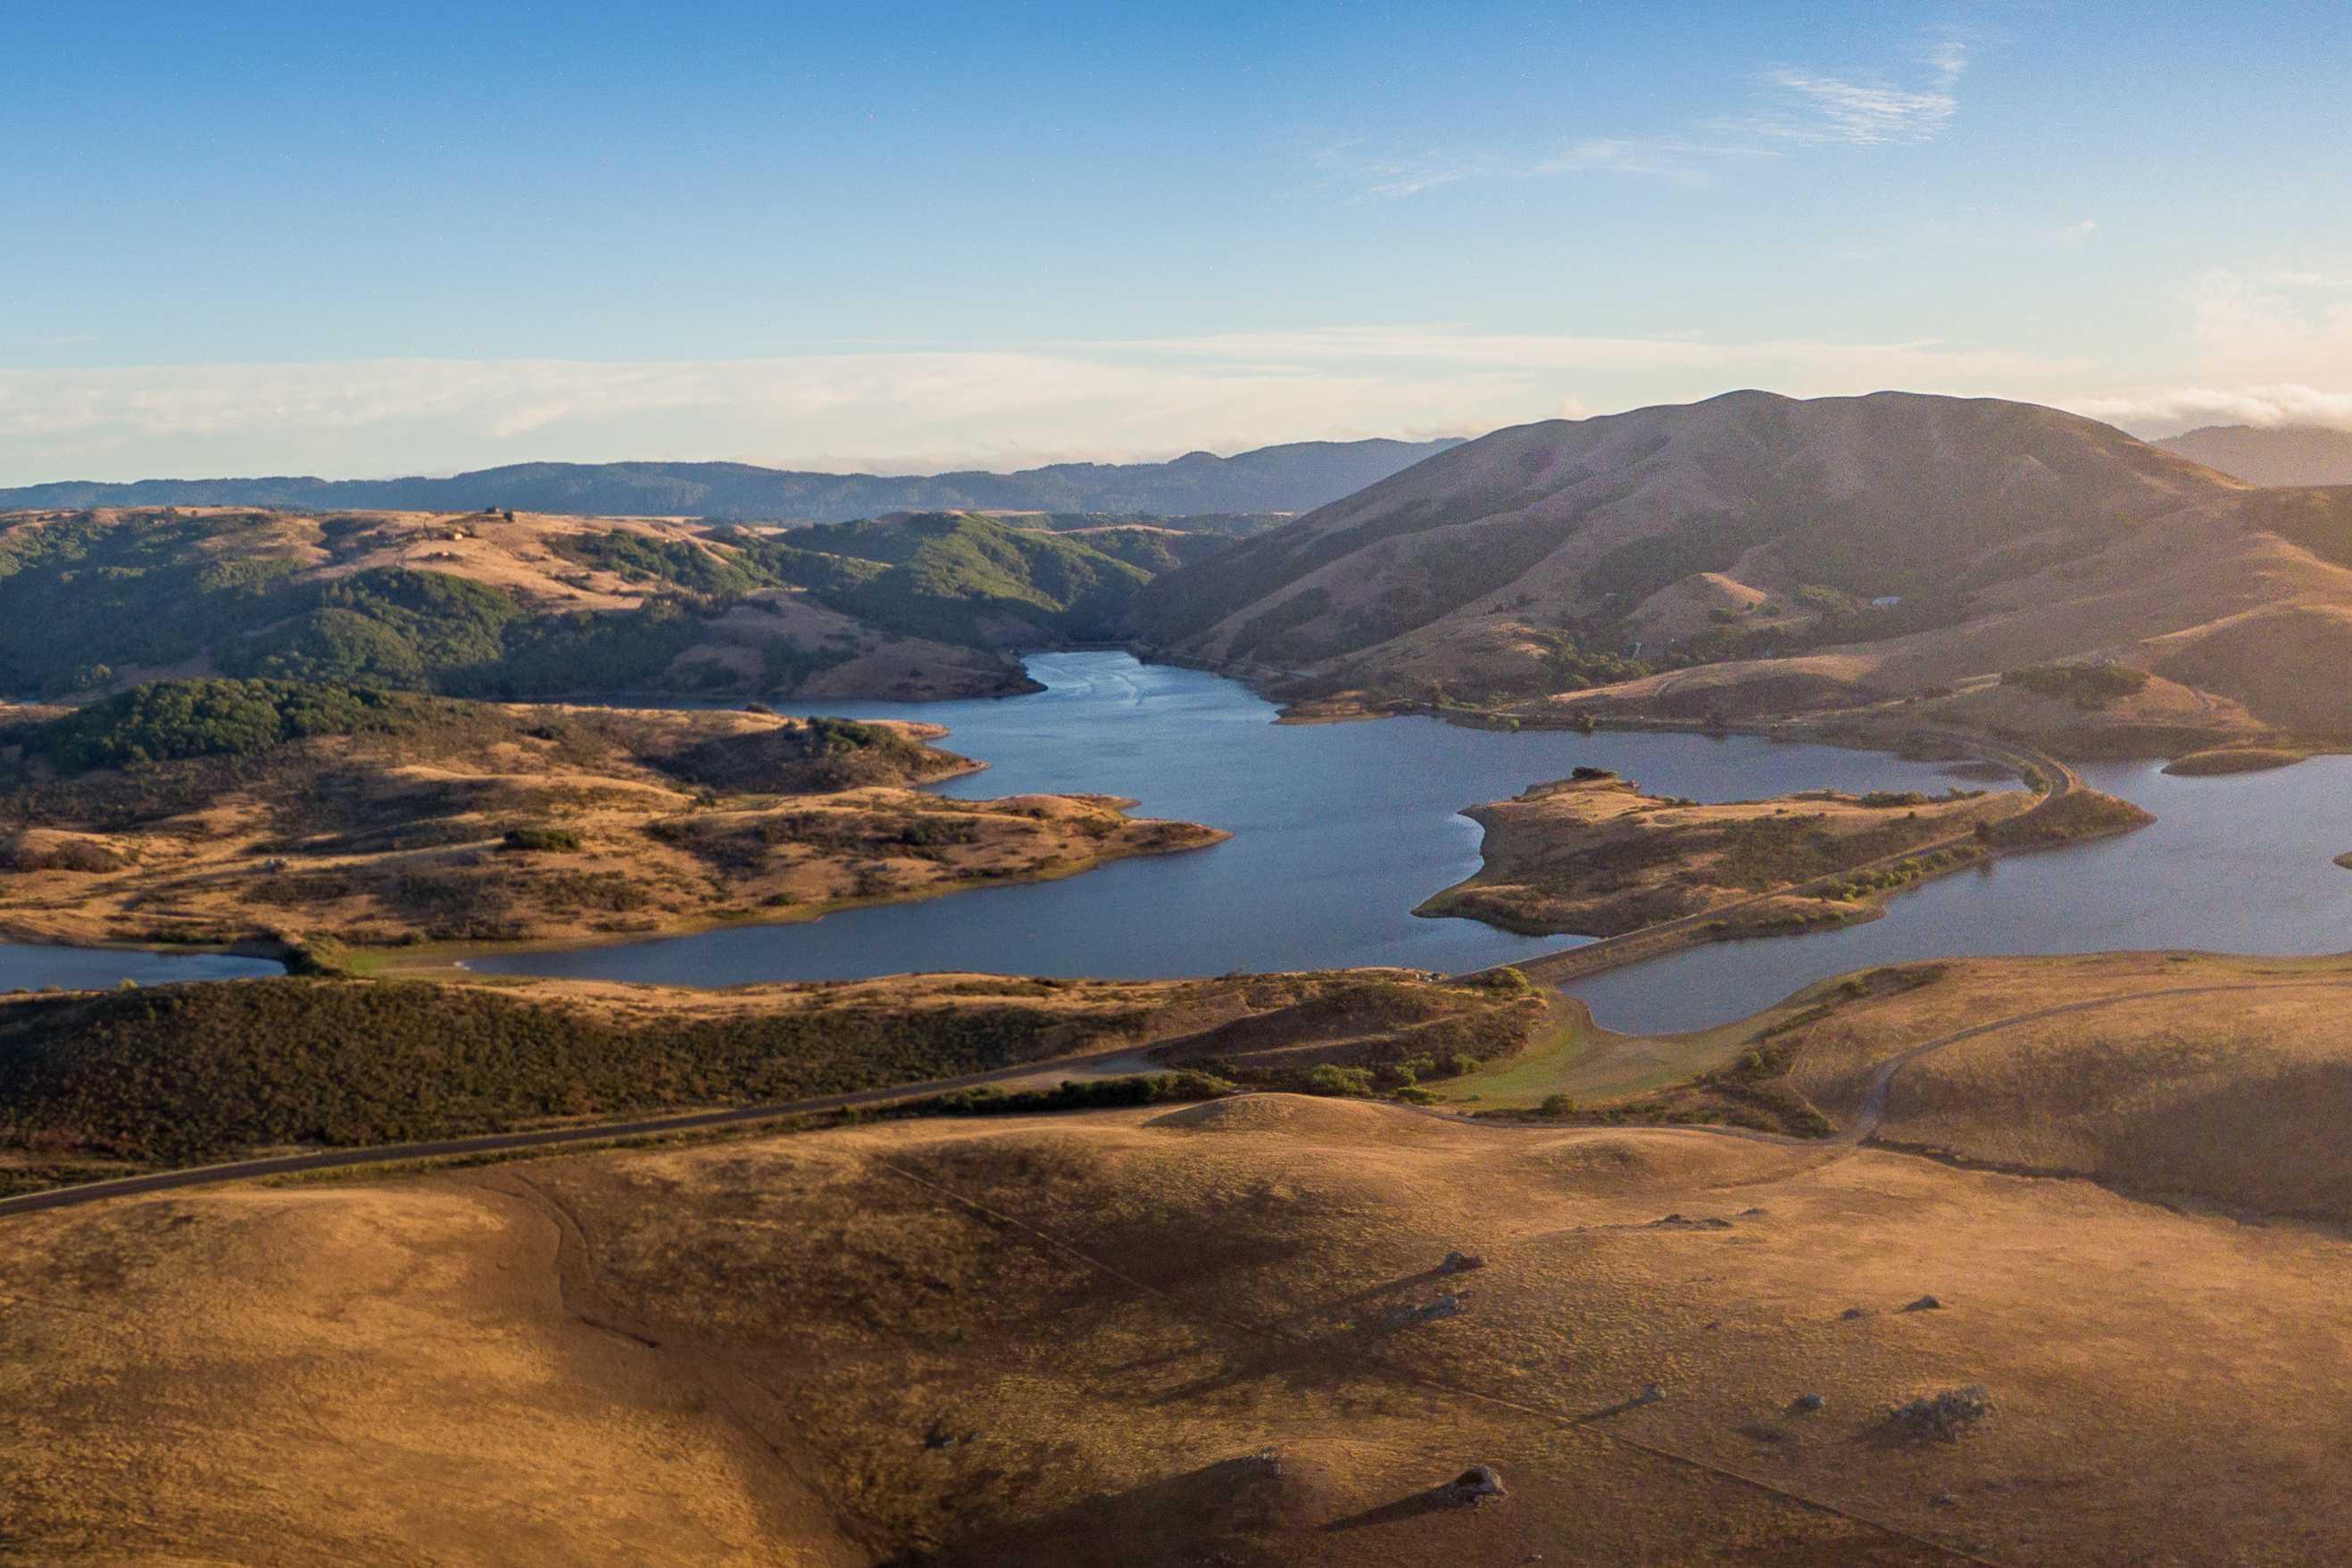 El Niño helps local reservoirs